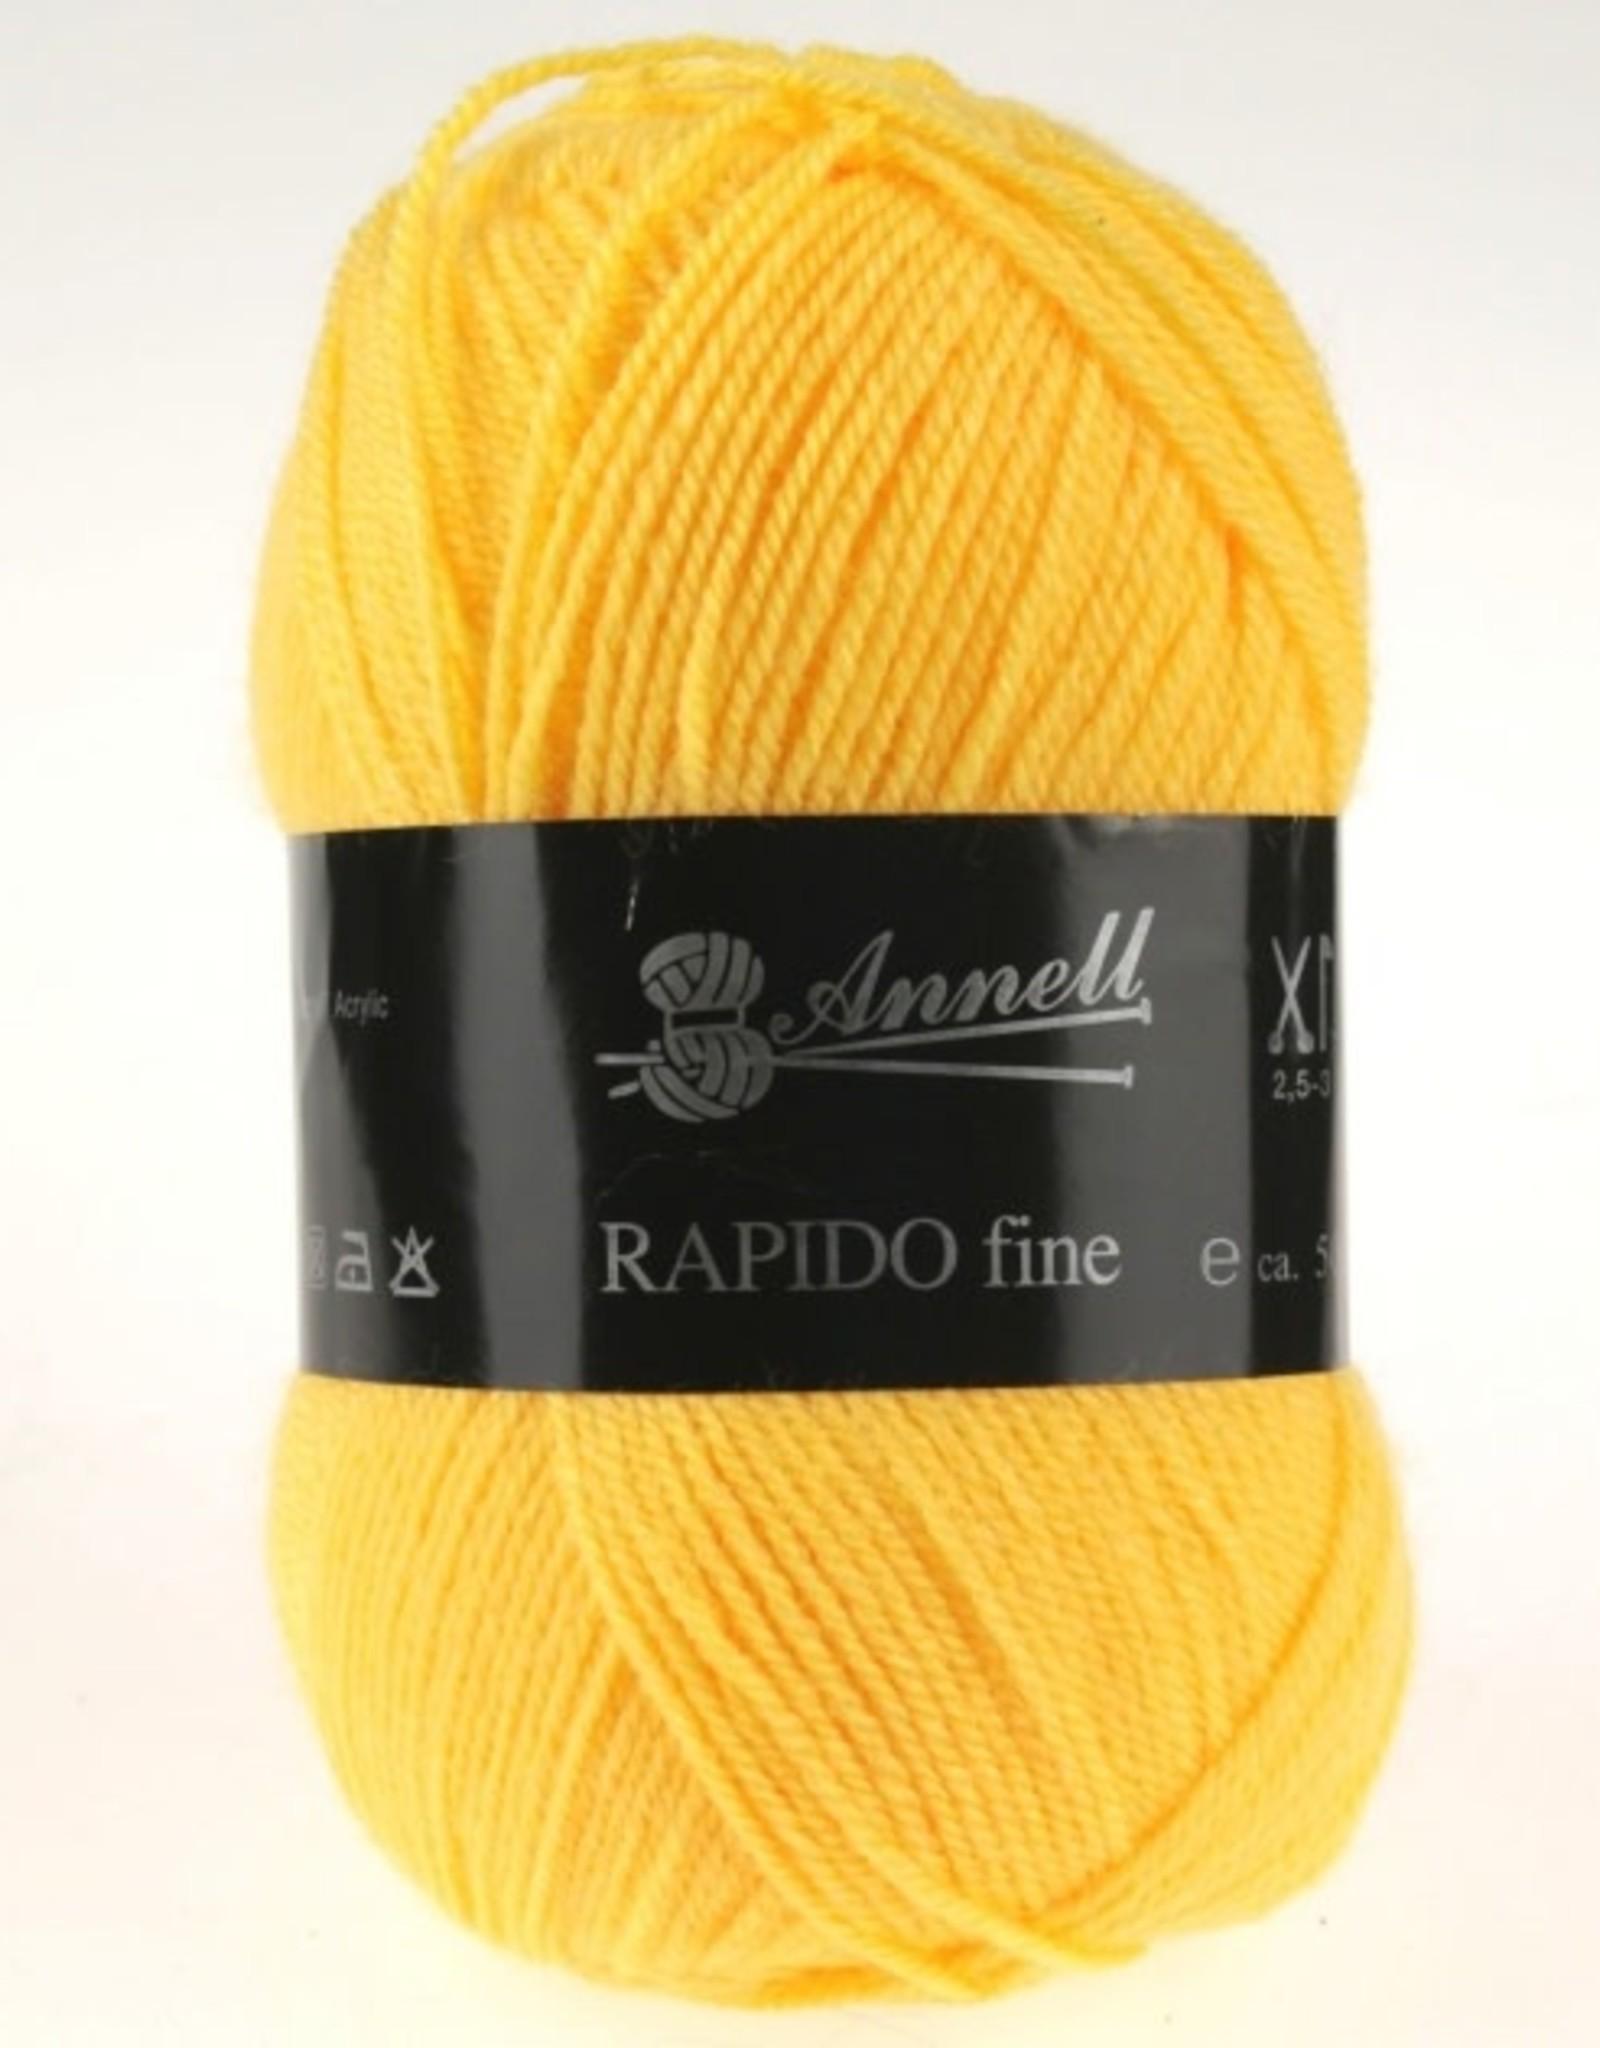 Annell Annell rapido fine 8215